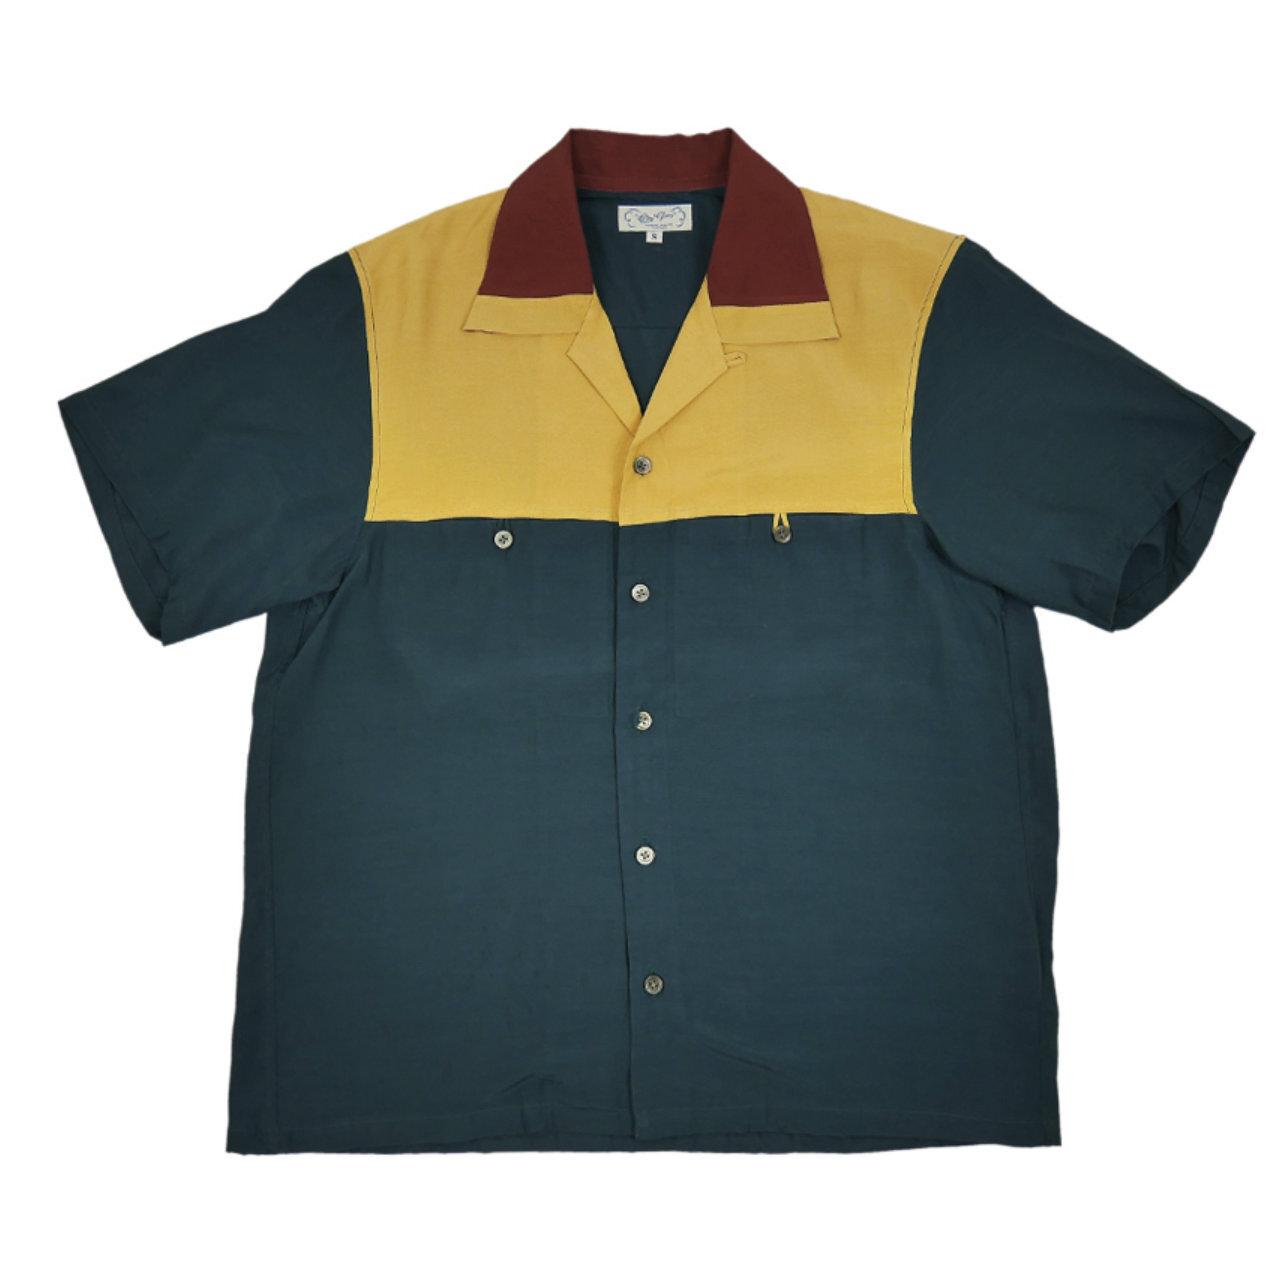 【Or Glory】 50's マルチカラー パネル切り替え オープンシャツ 〈Green〉